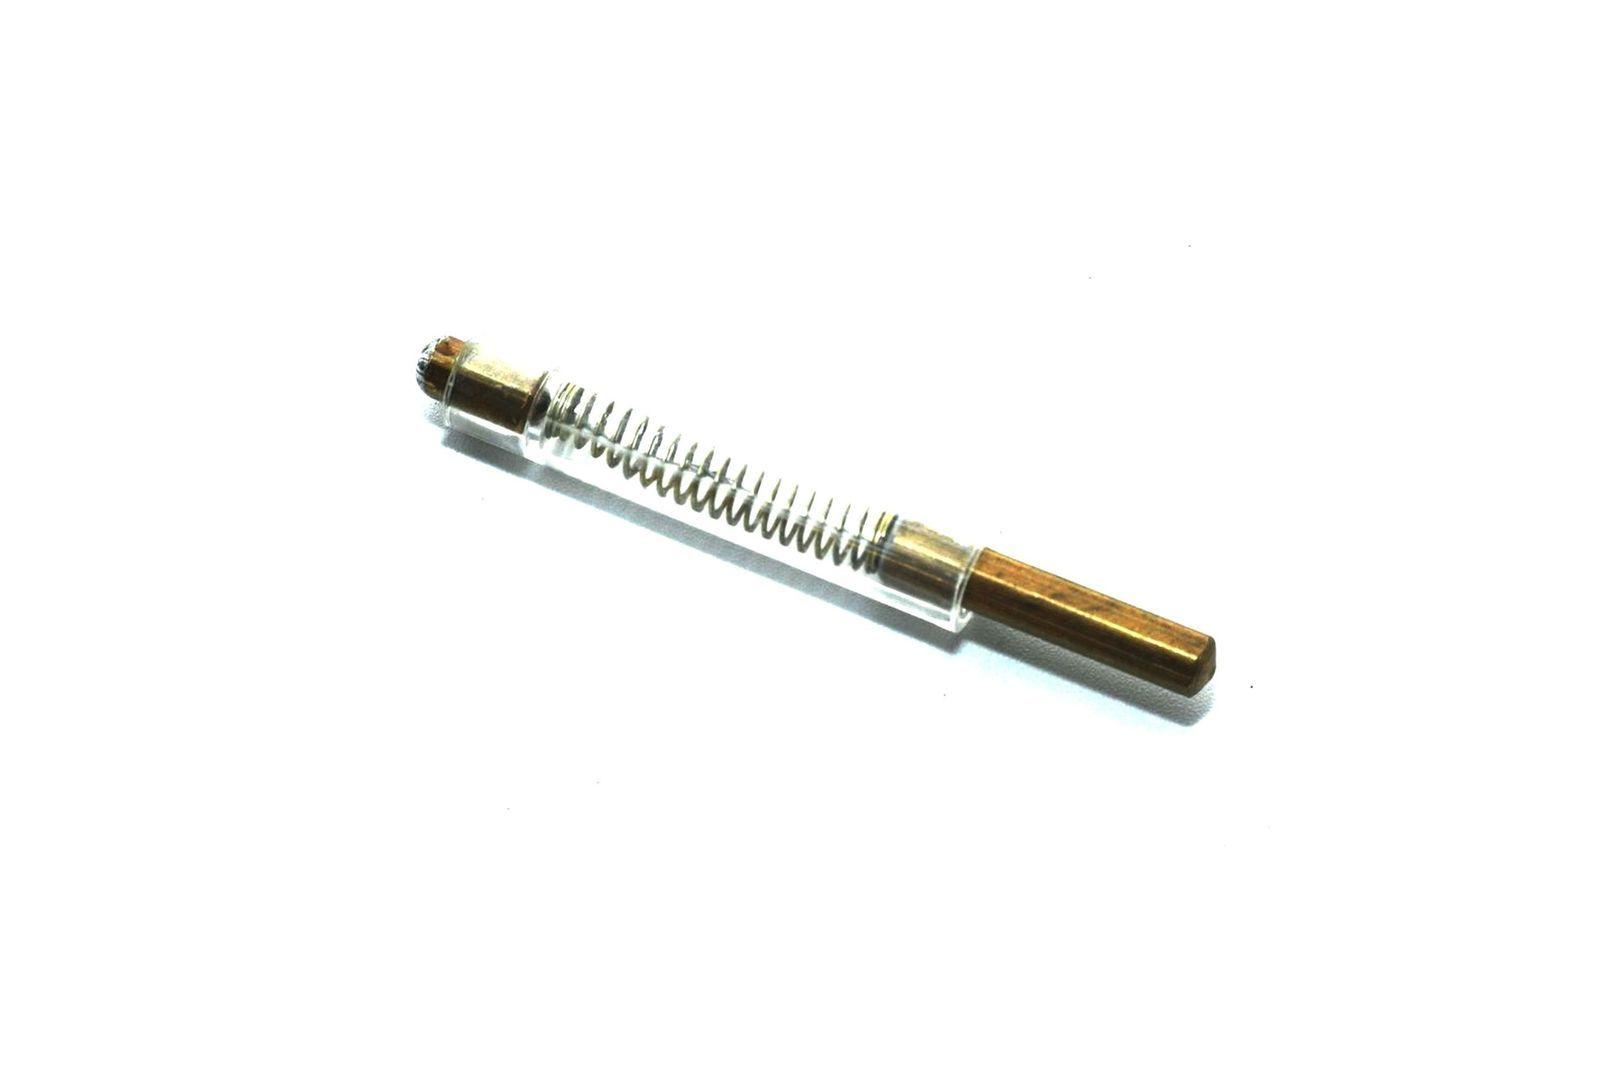 #2659-02A Kontaktstift Hupenknopf Moto-Lita Triumph TR5, TR250, TR6, 142534X